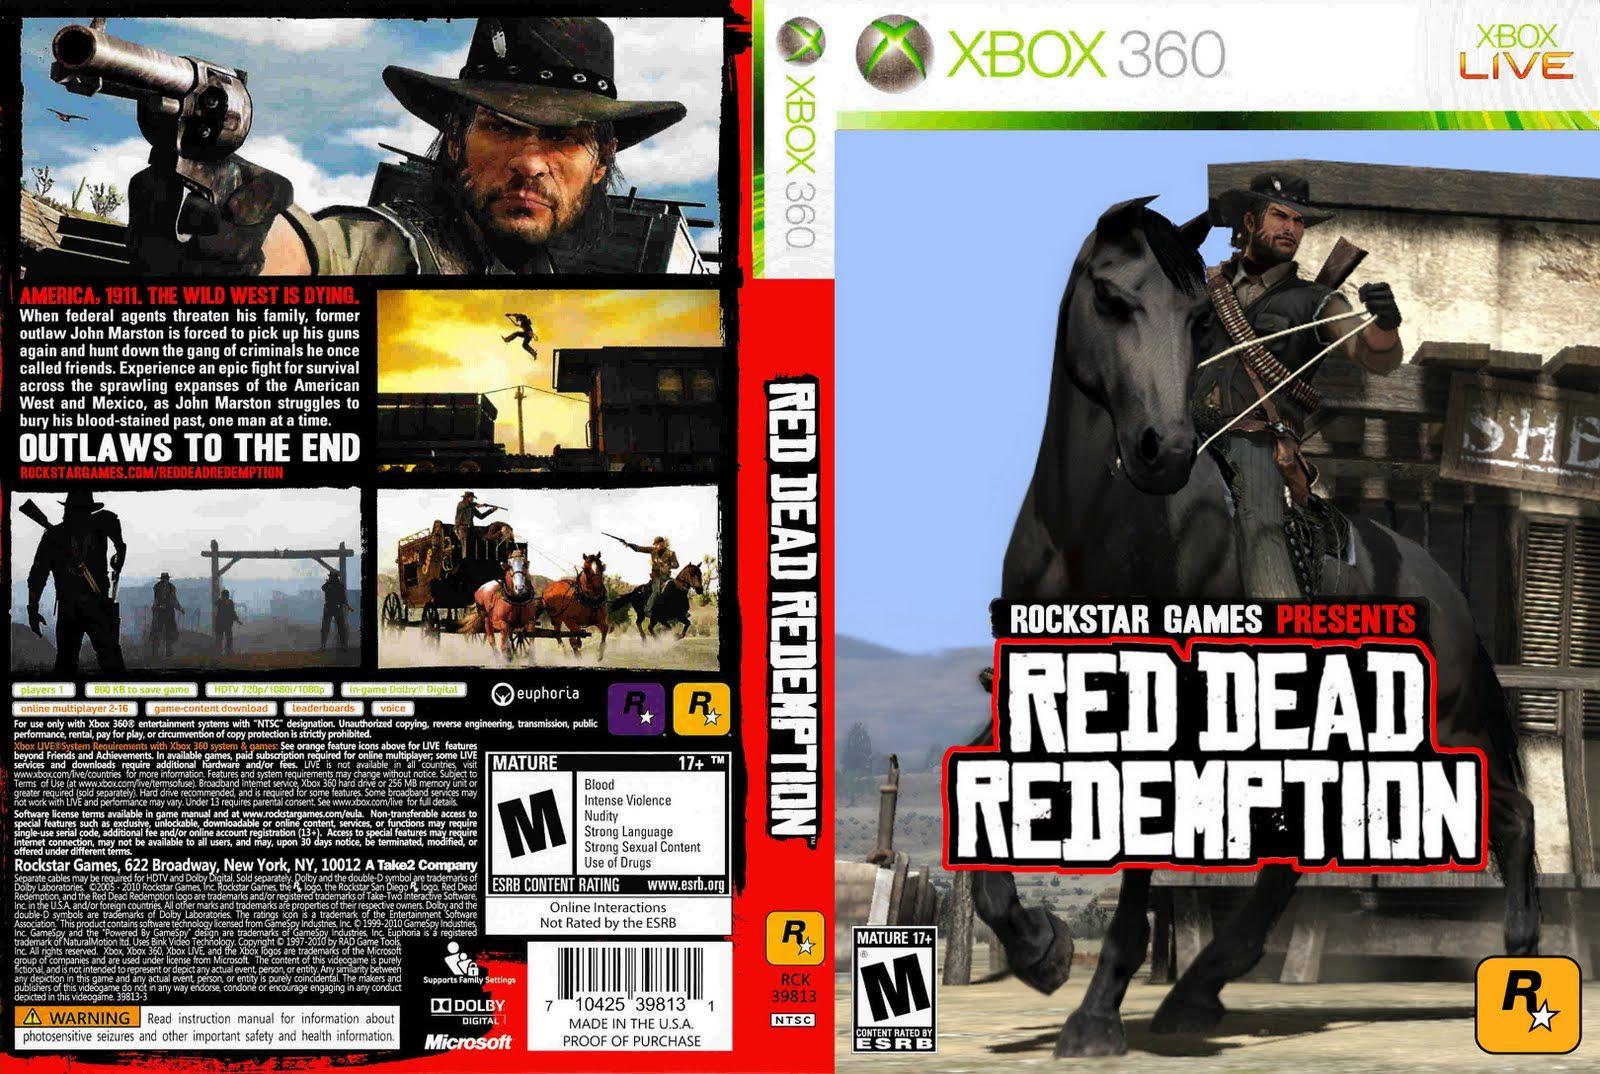 Red dead.redemption ntsc u rf Red dead redemption, Reds